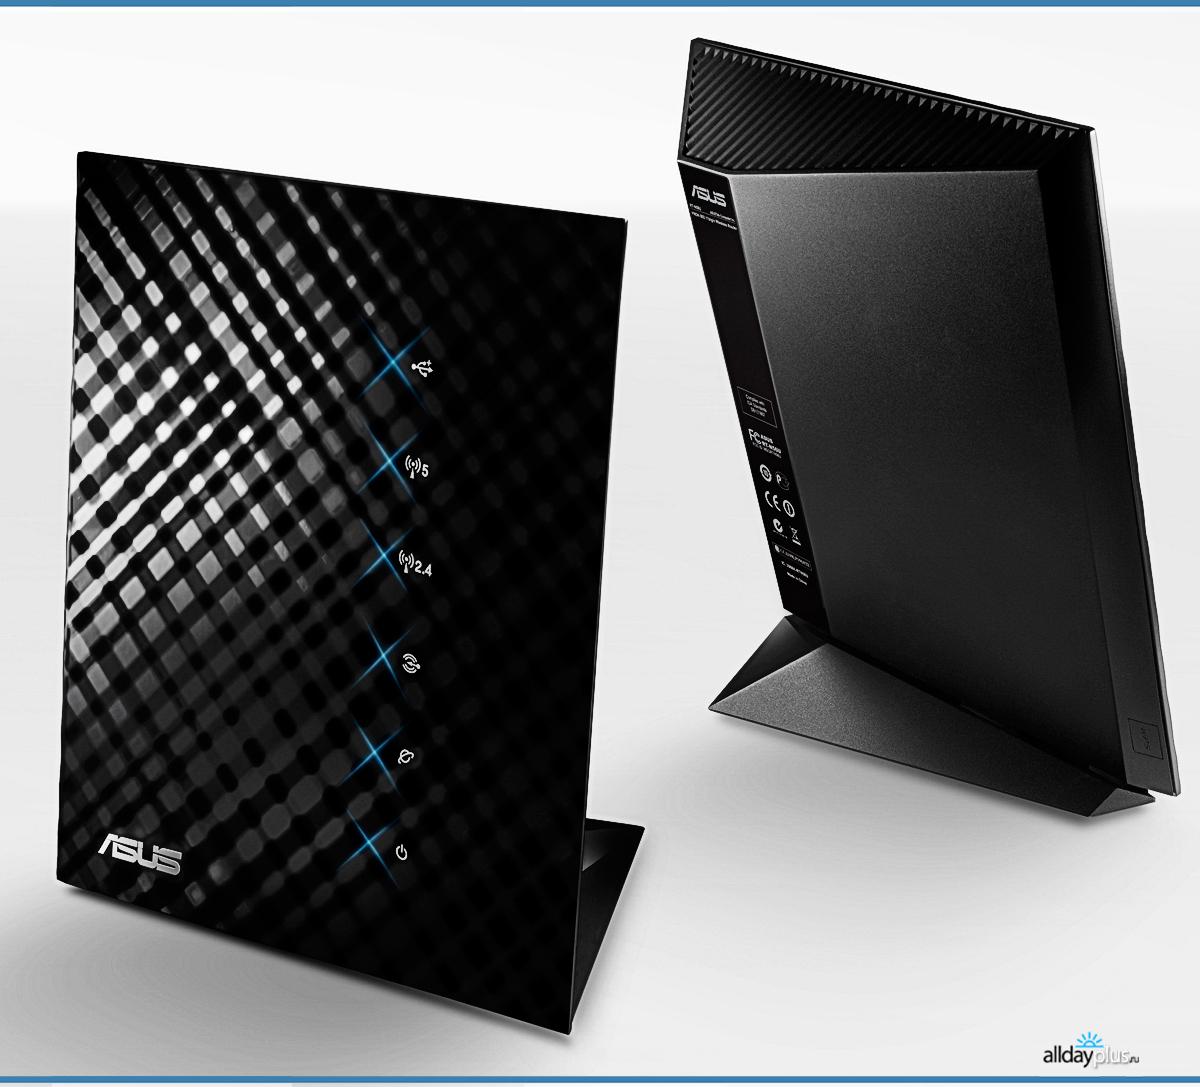 Asus RT-N56U Black Diamond - дизайнерский WiFi роутер